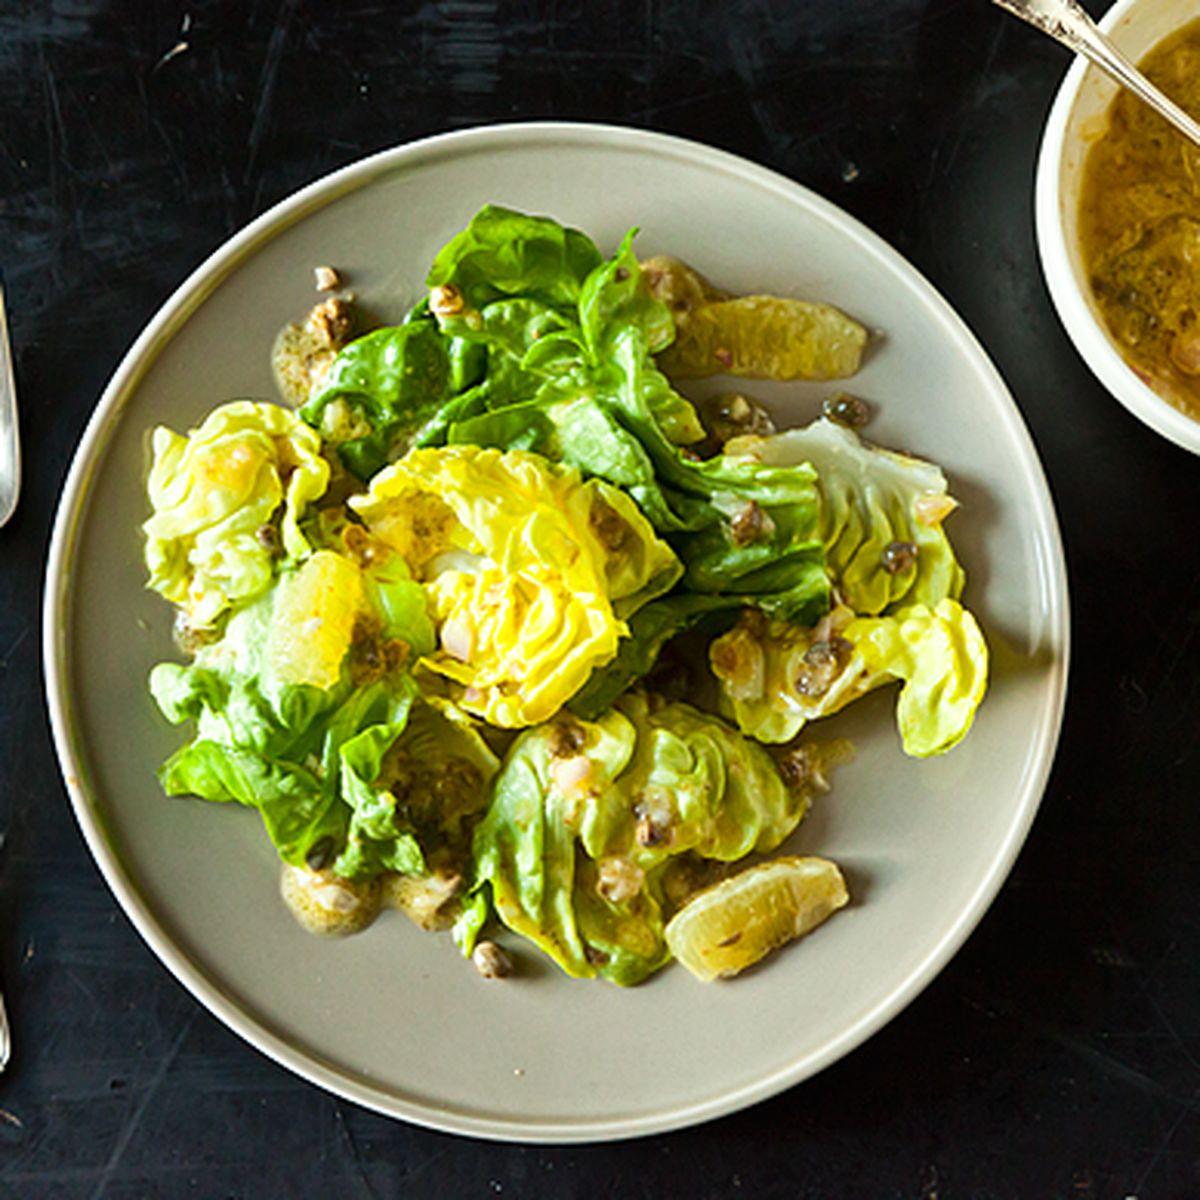 April Bloomfields Lemon Caper Dressing Recipe On Food52